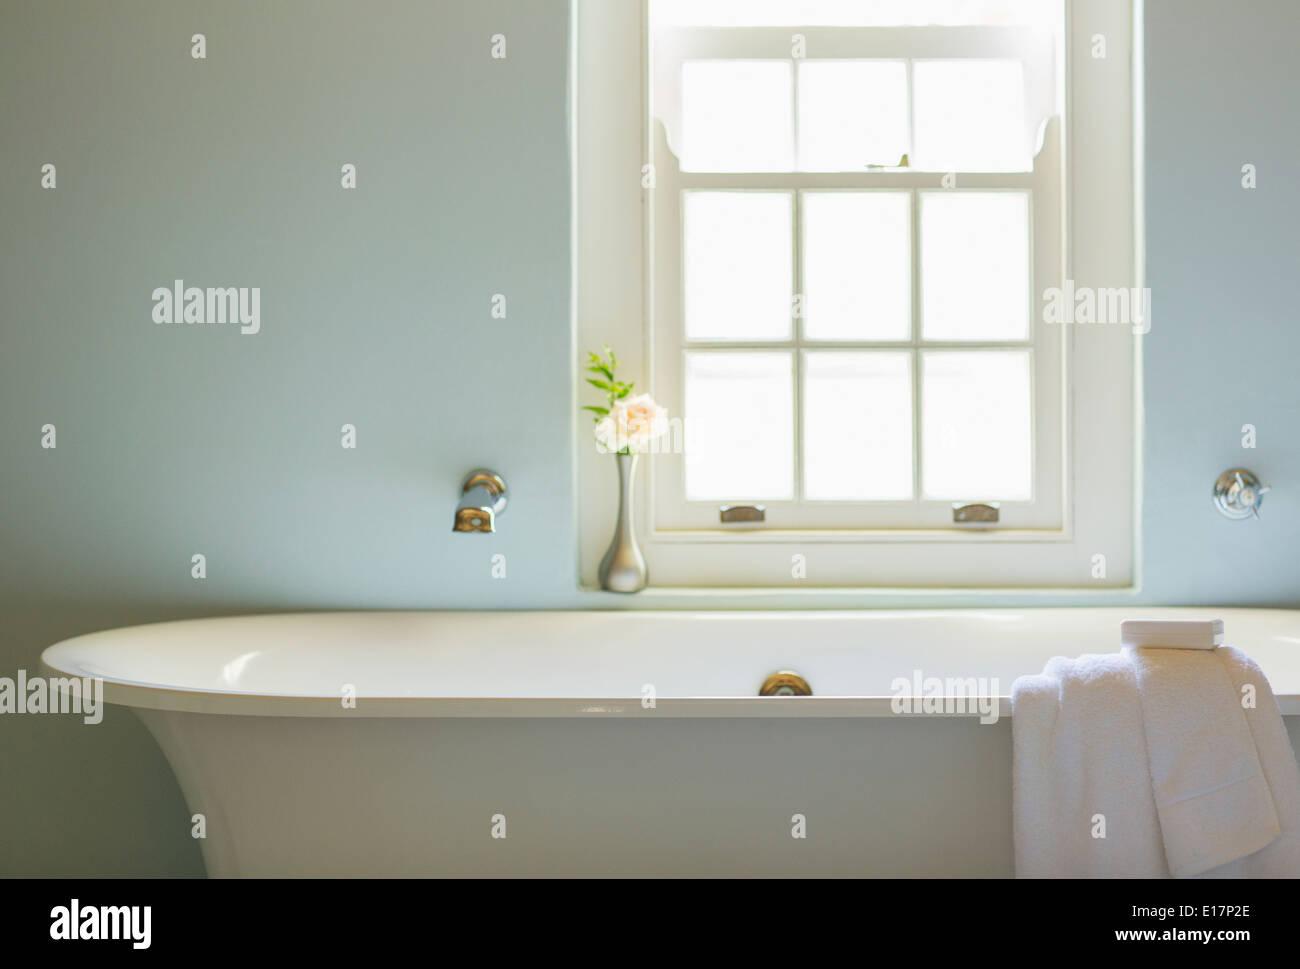 soaking tub stockfotos soaking tub bilder alamy. Black Bedroom Furniture Sets. Home Design Ideas